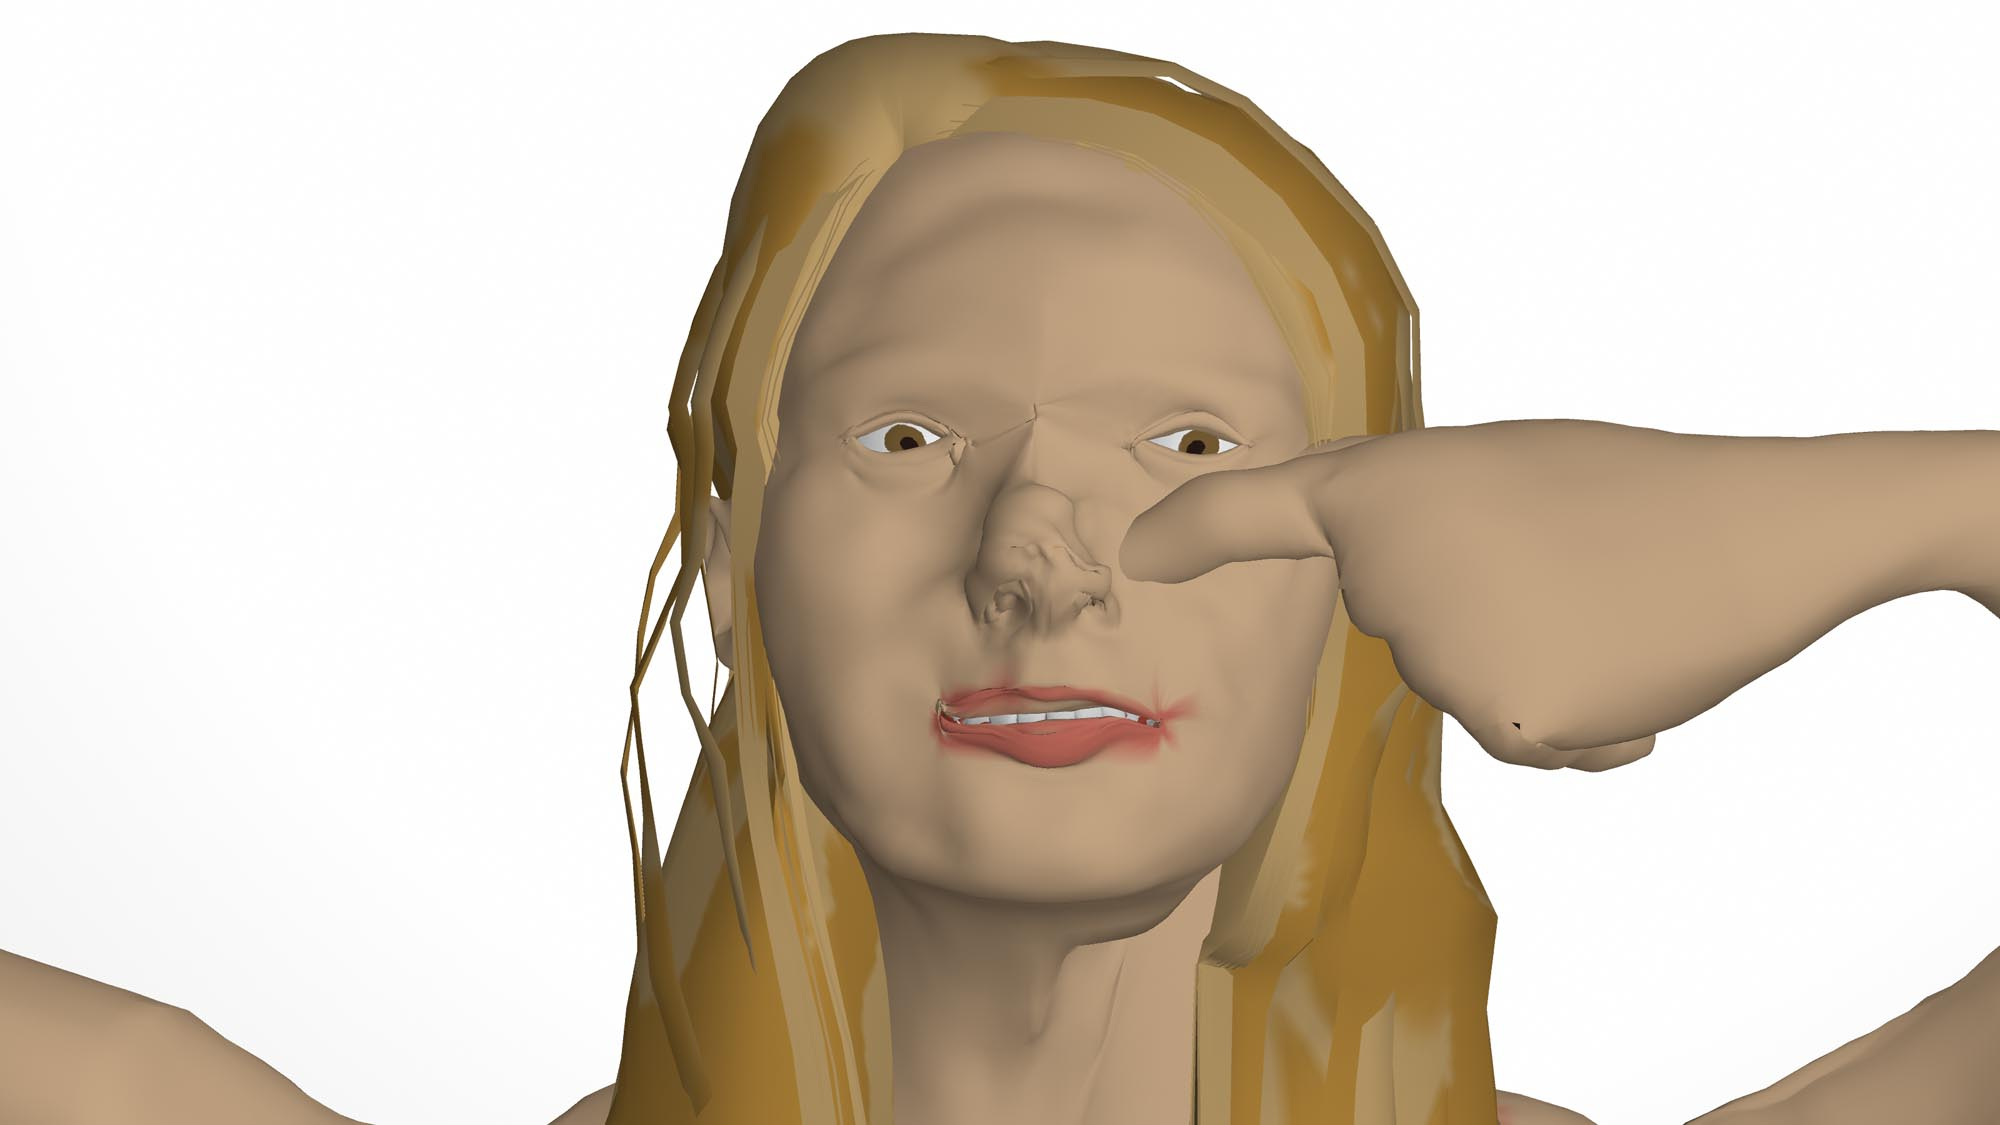 Jill 2016, looping CG animation, 7 minutes